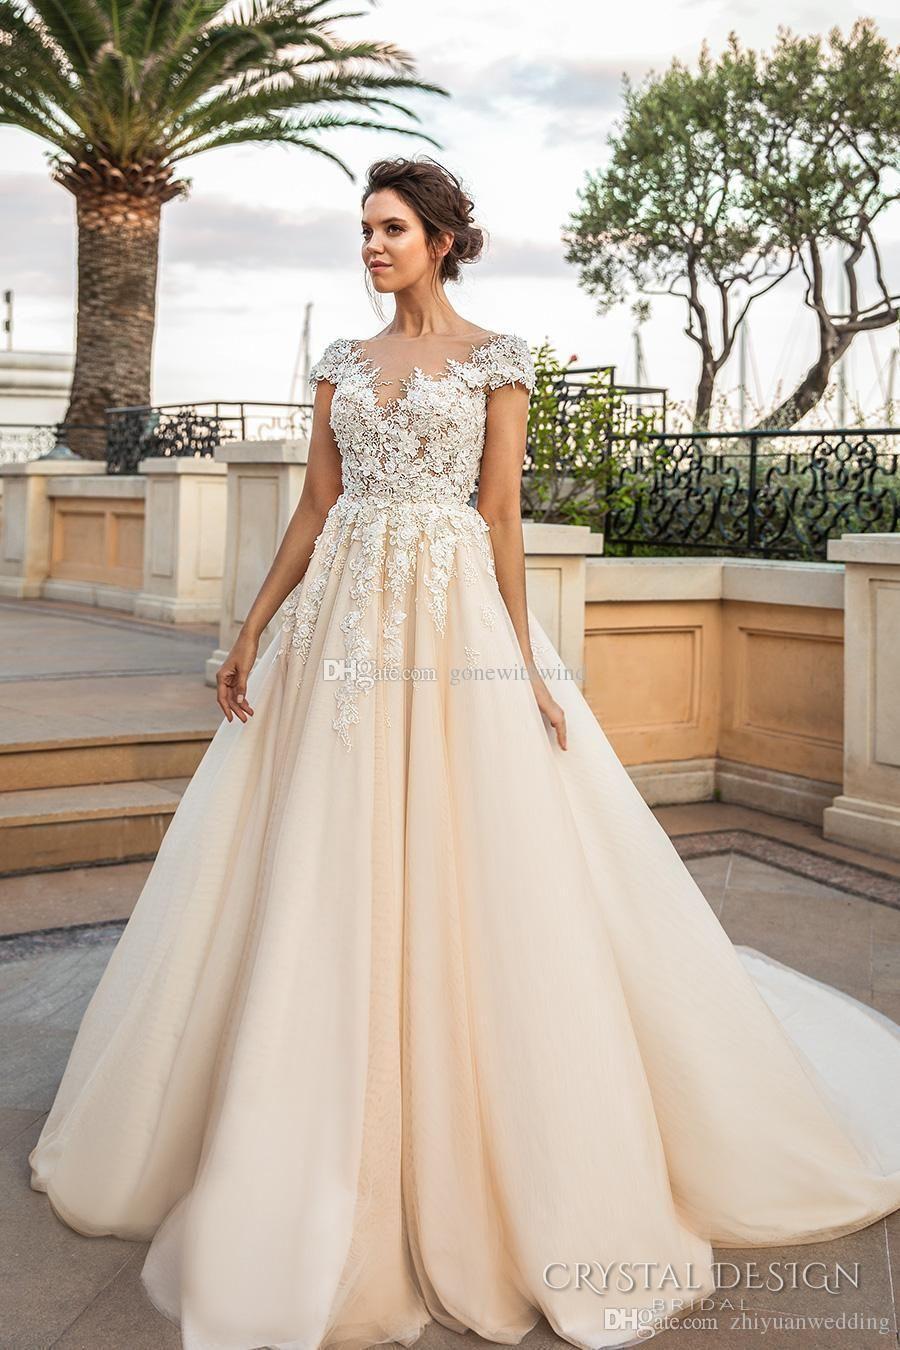 Pin by jooana on wedding ideas for you | Pinterest | Wedding dresses ...